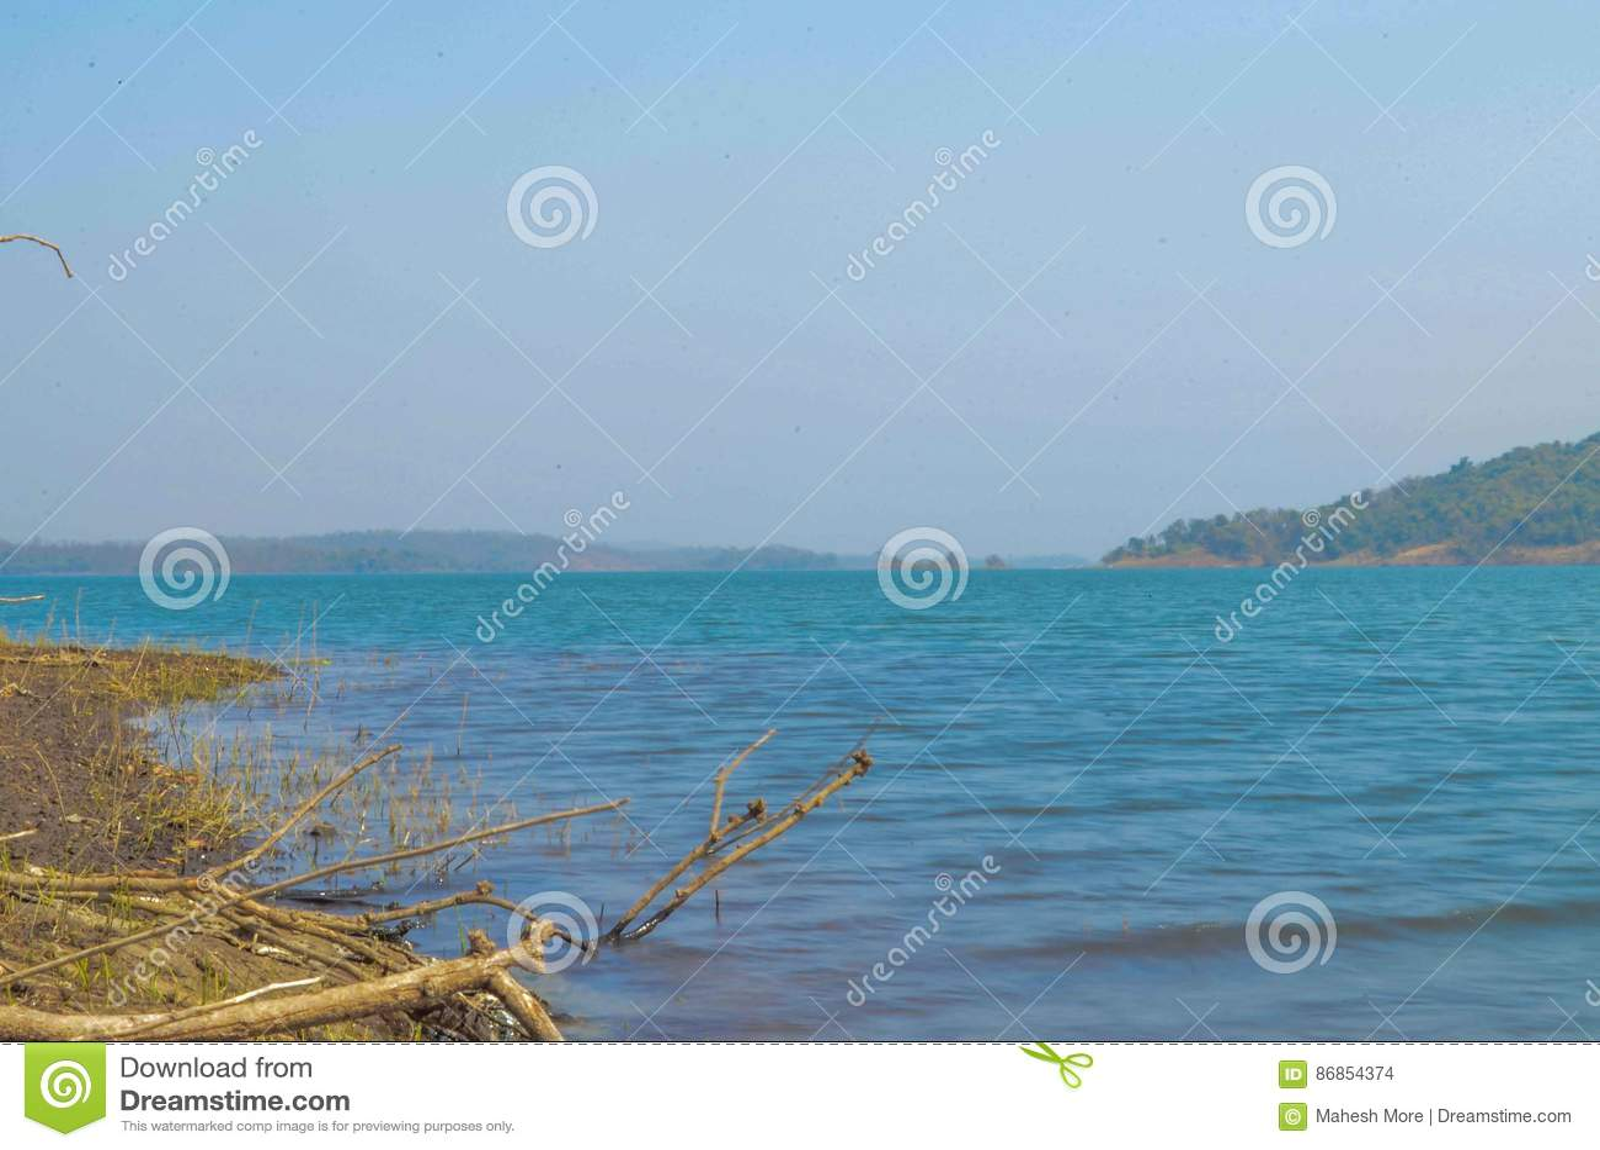 barvi dam stock photo image of near badlapur thane 86854374